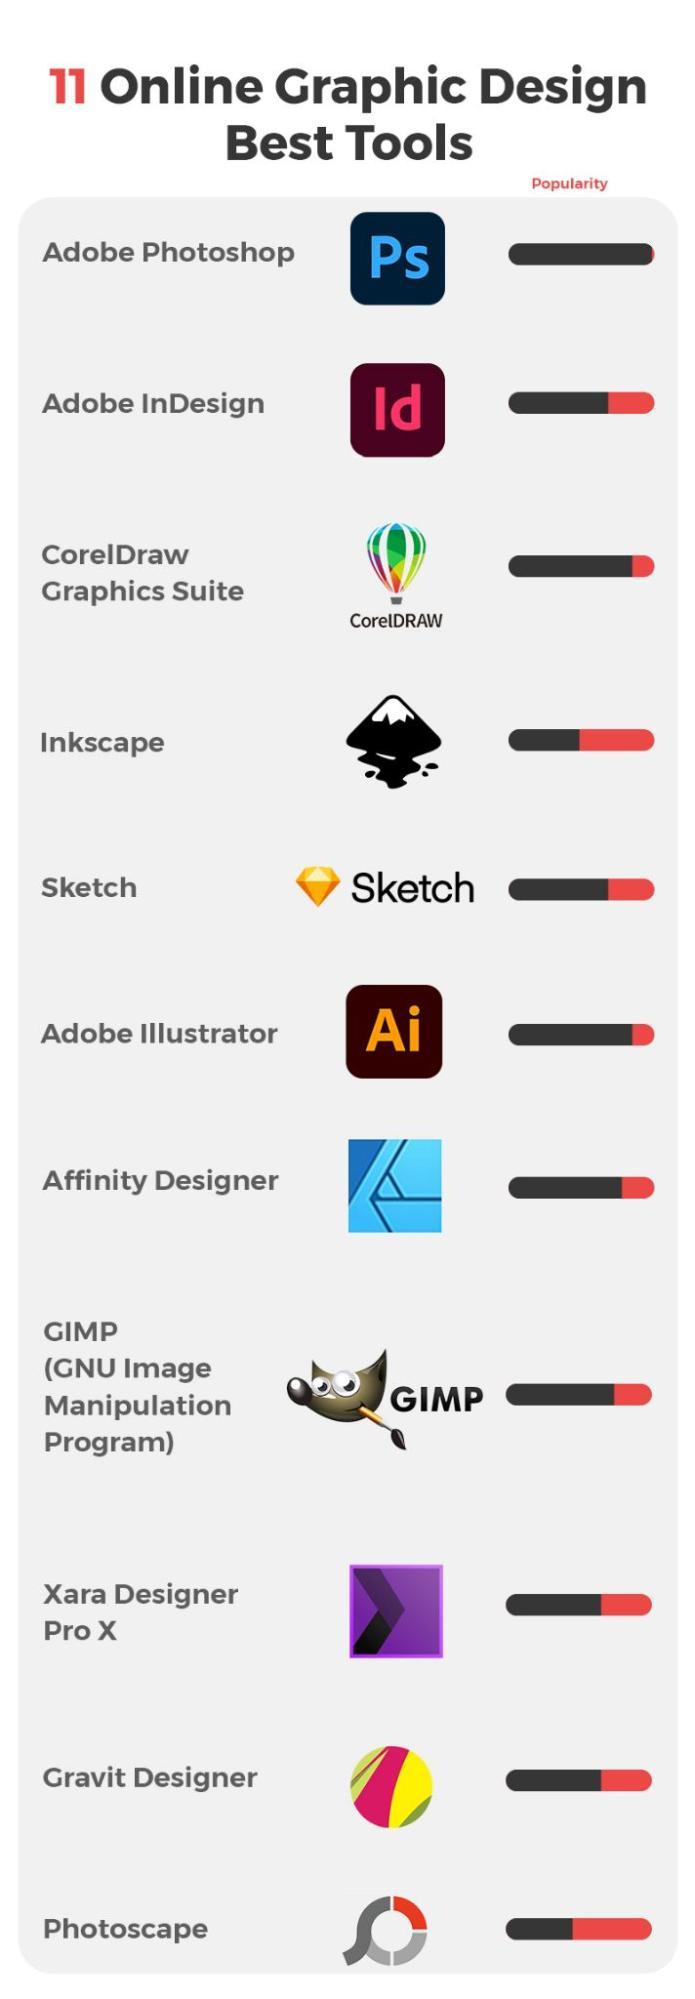 11 Best Online Graphic Design Tools